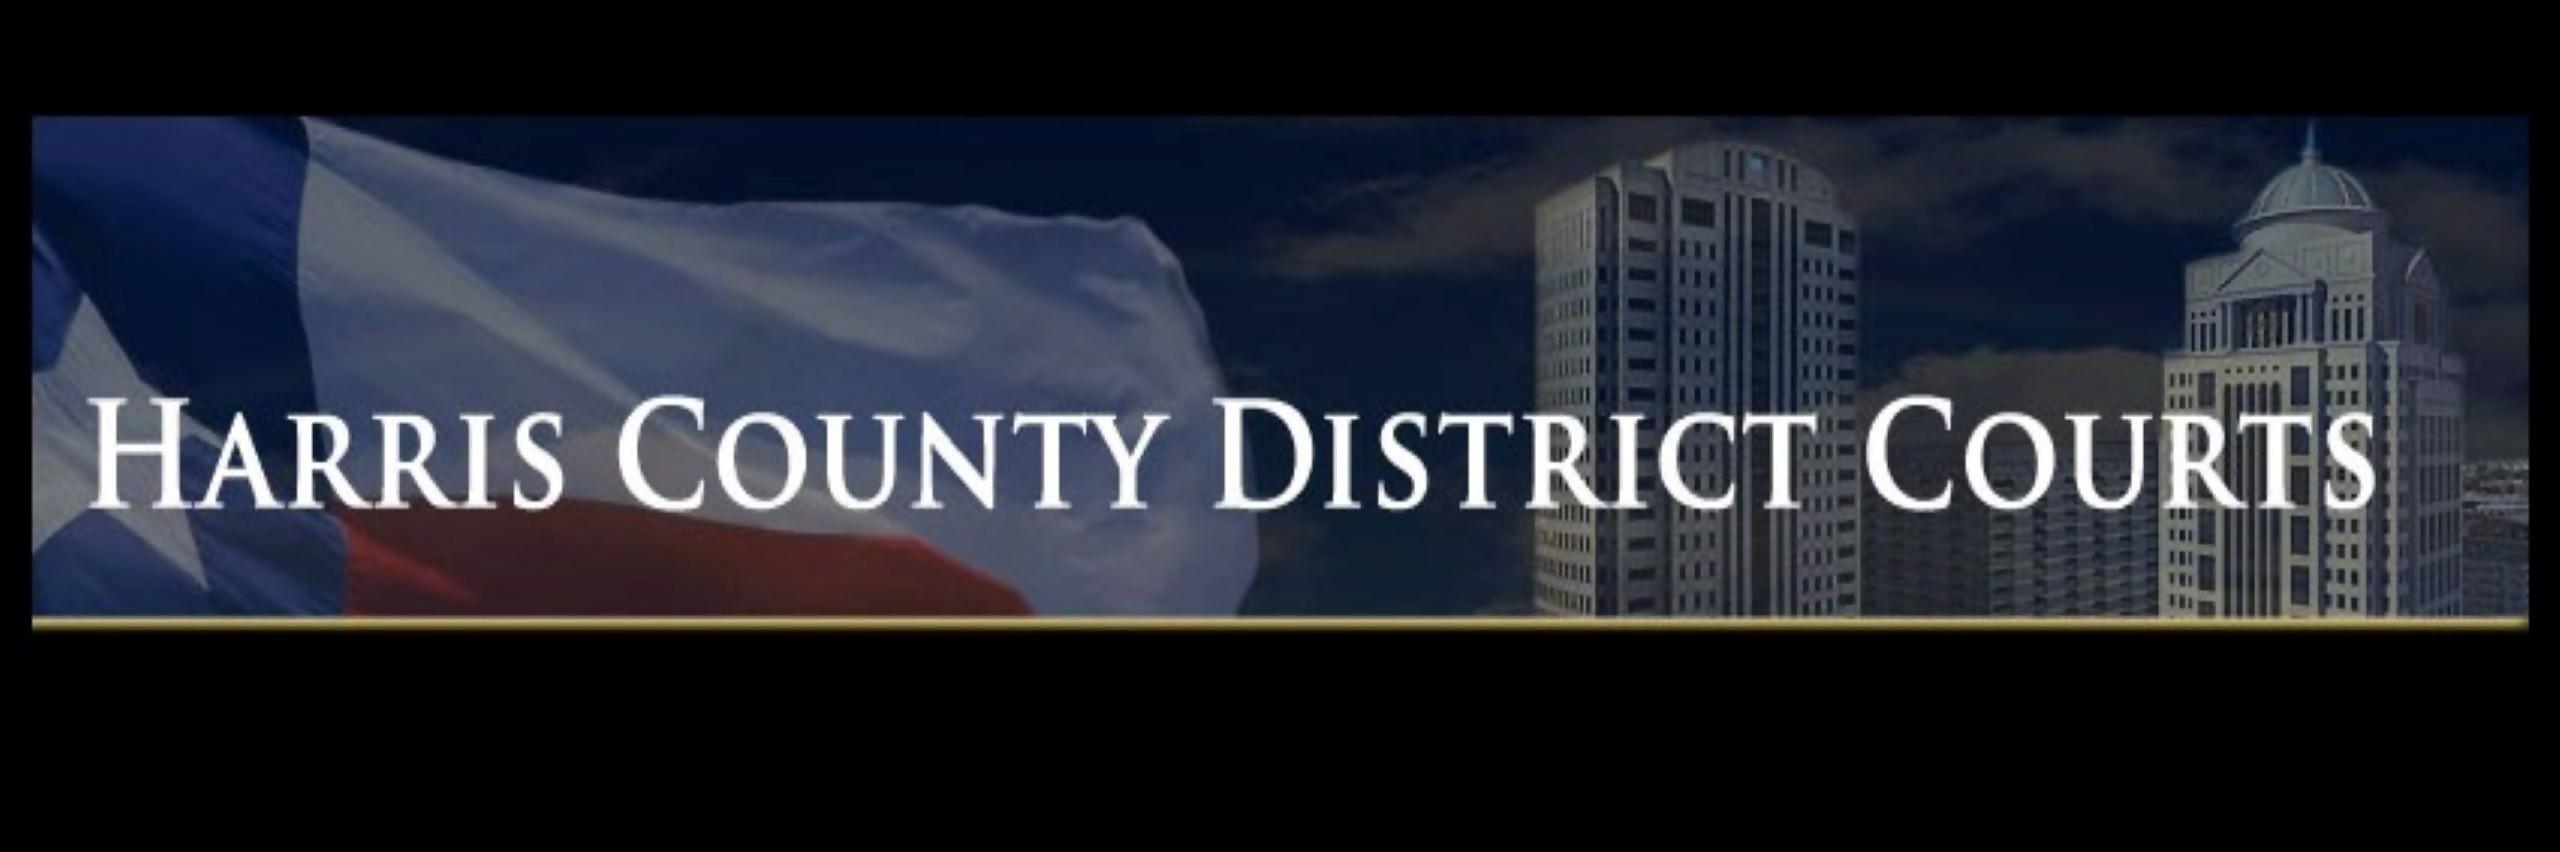 80th District Court - Live Stream